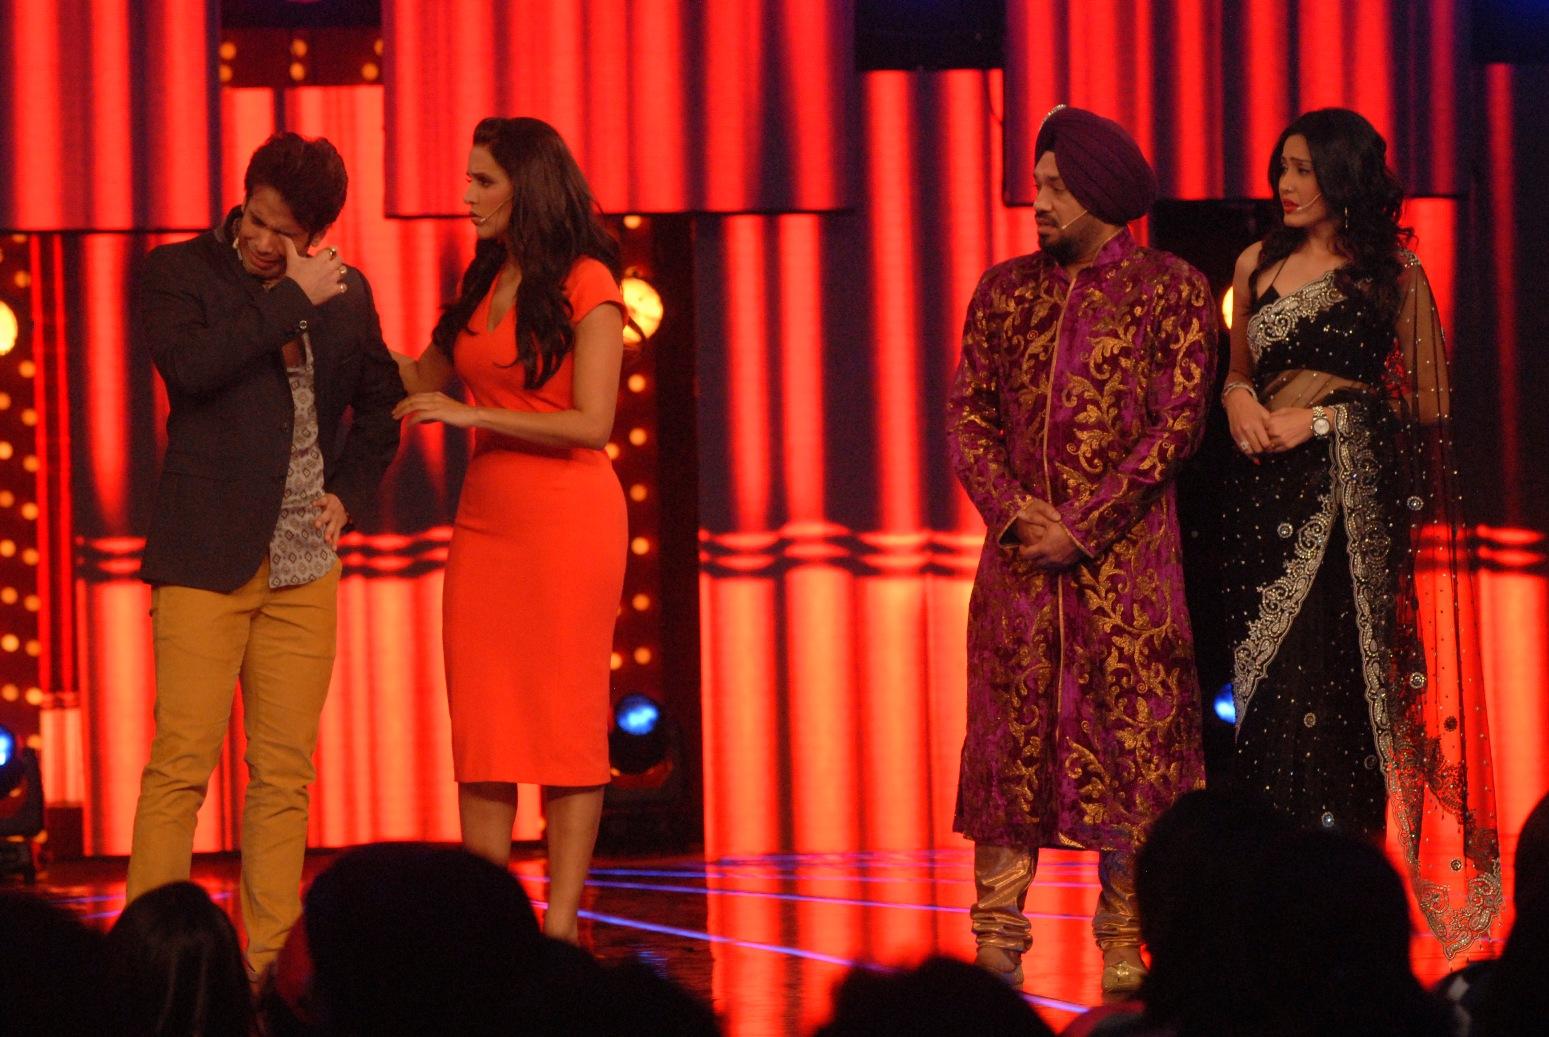 dress - Karwal Vishal in bigg boss-6 video